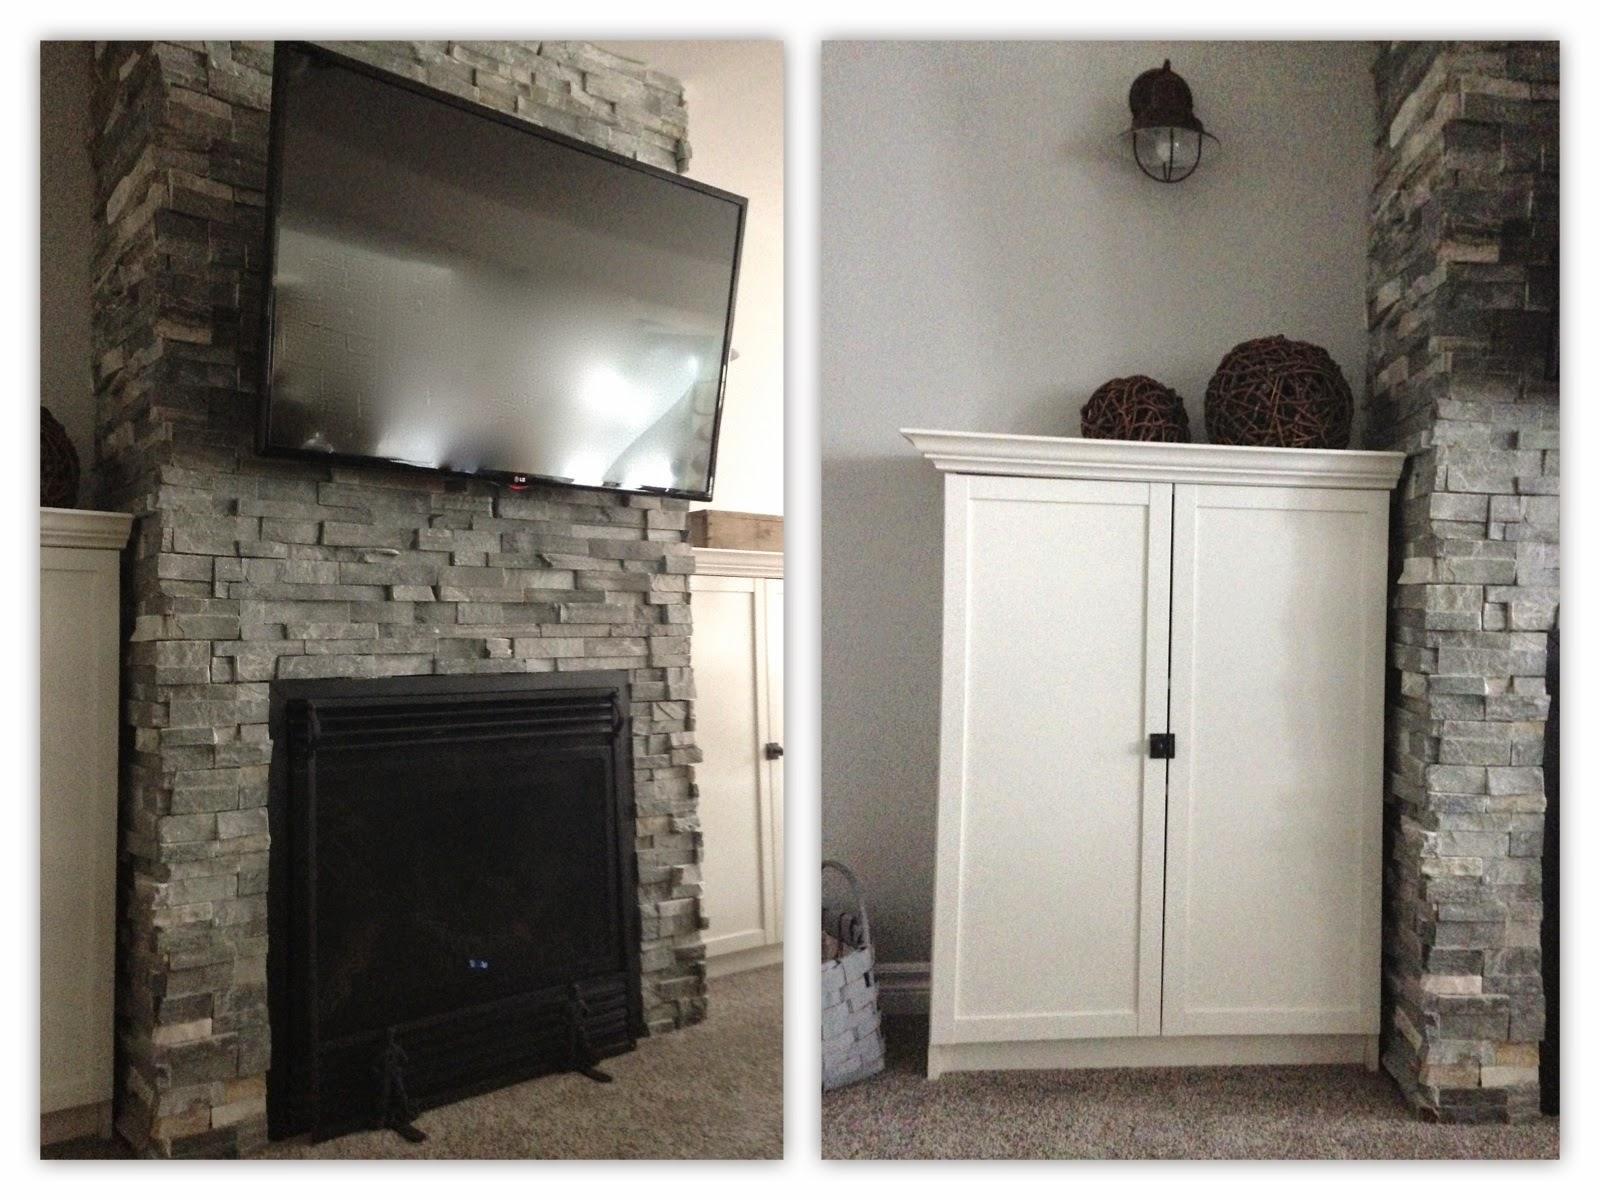 2Perfection Decor: Basement Family Room Reveal